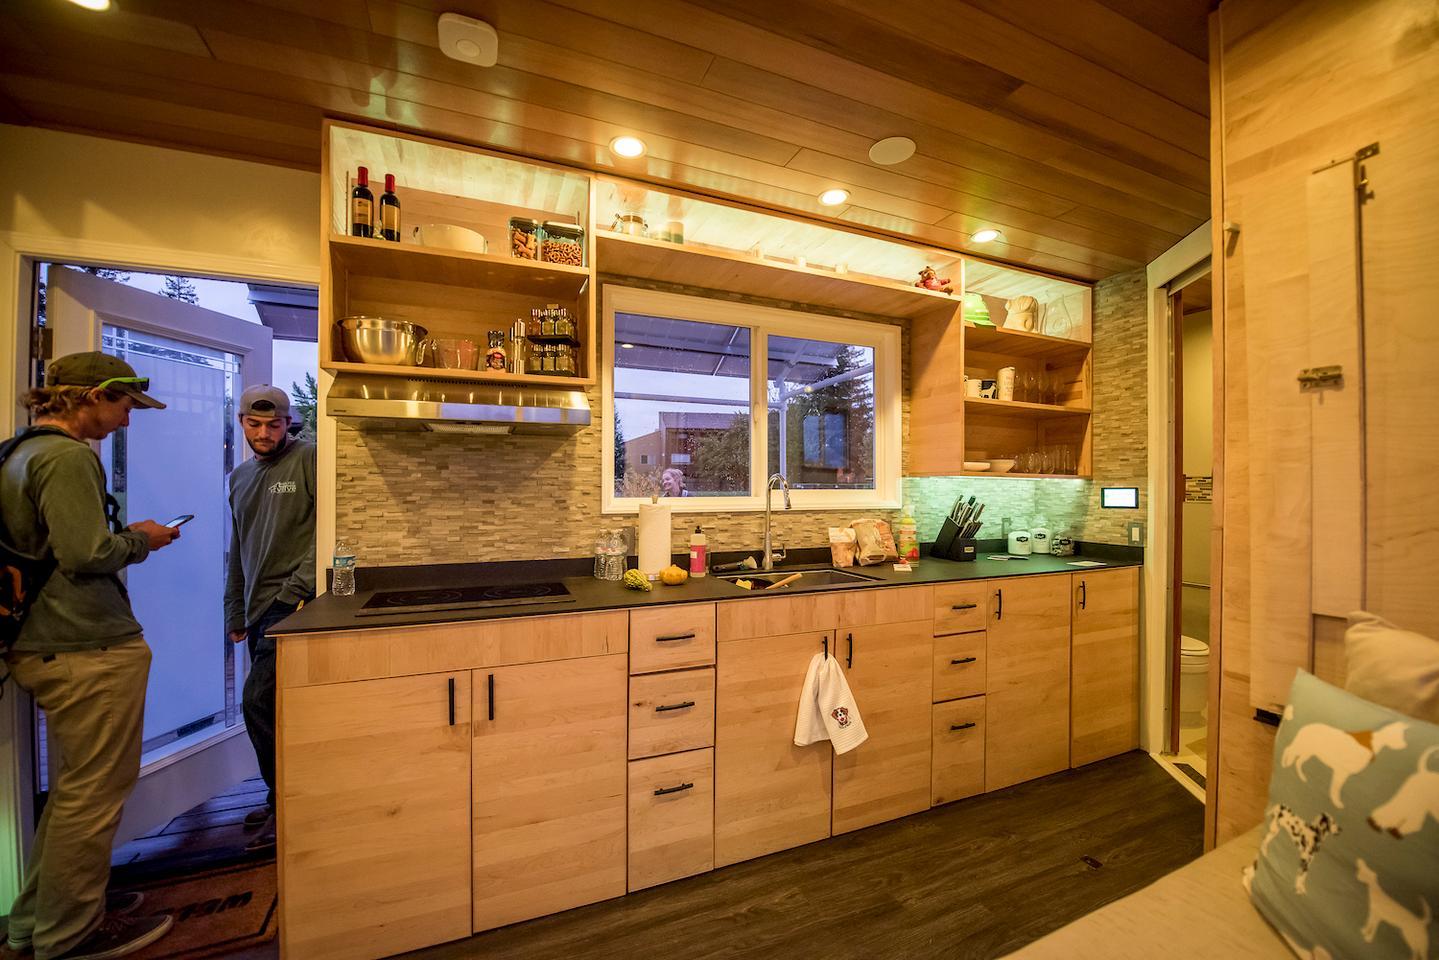 The kitchen inside the Revolve House